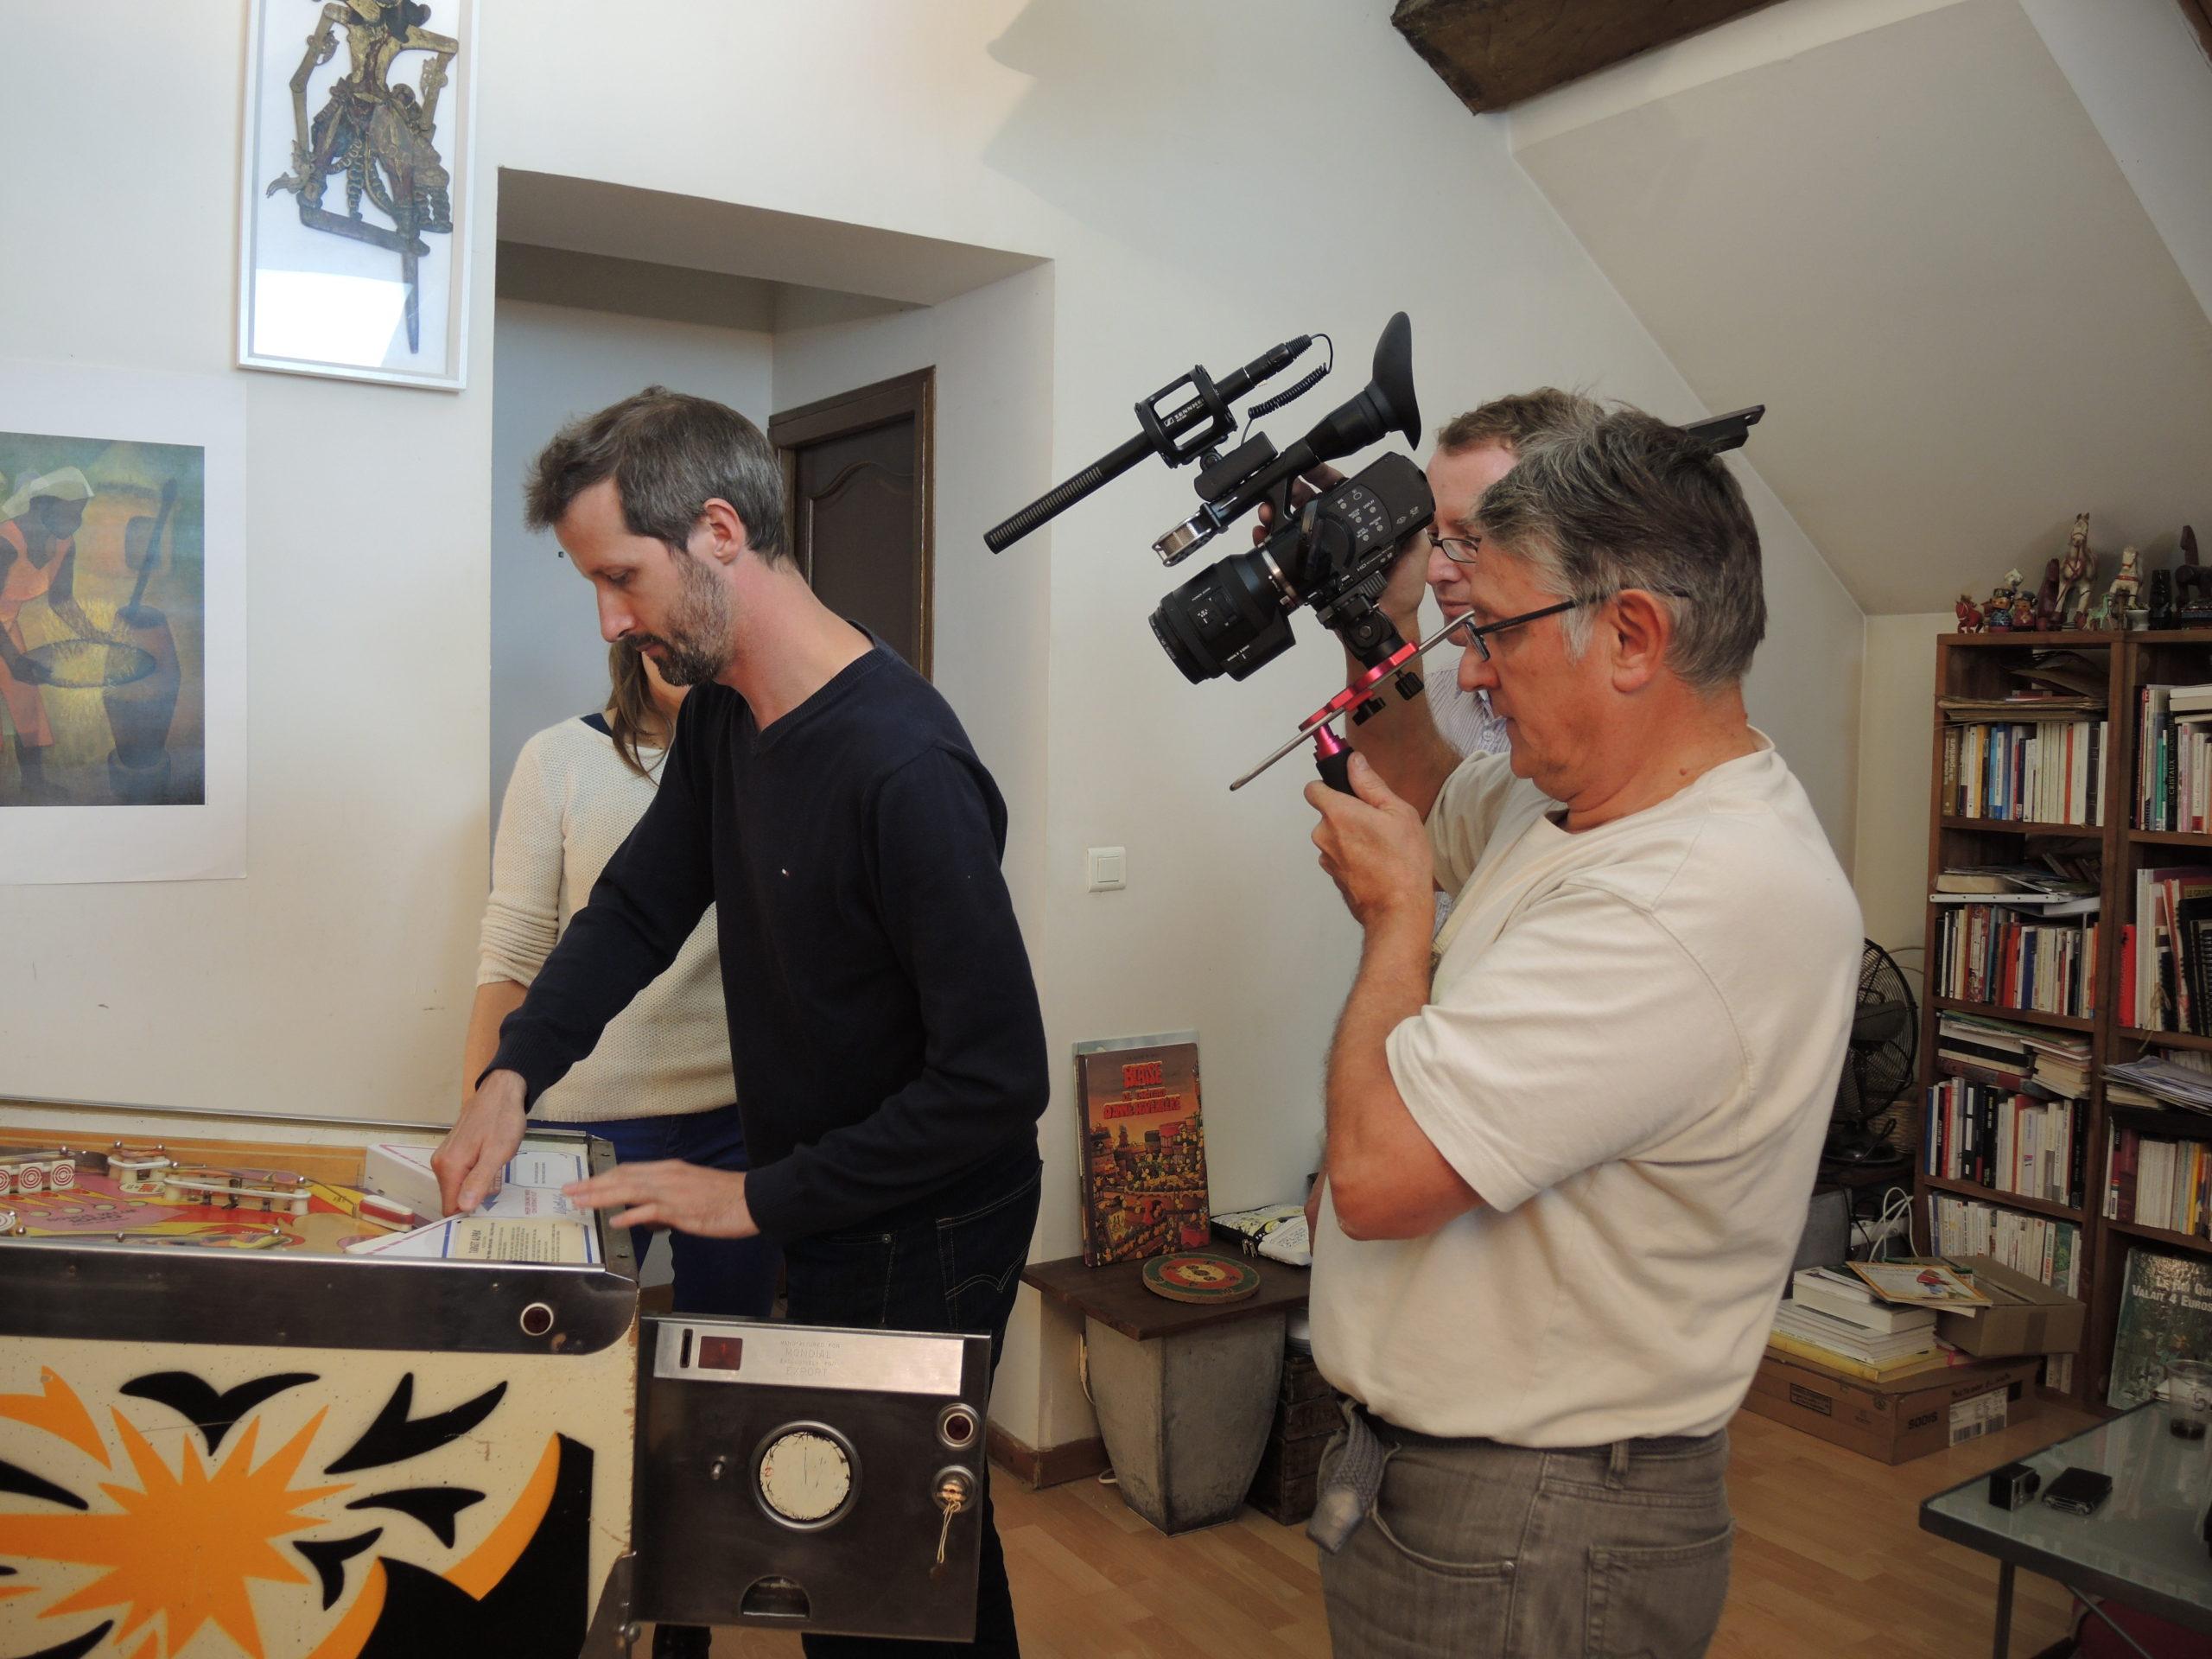 Game over photos tournage 42